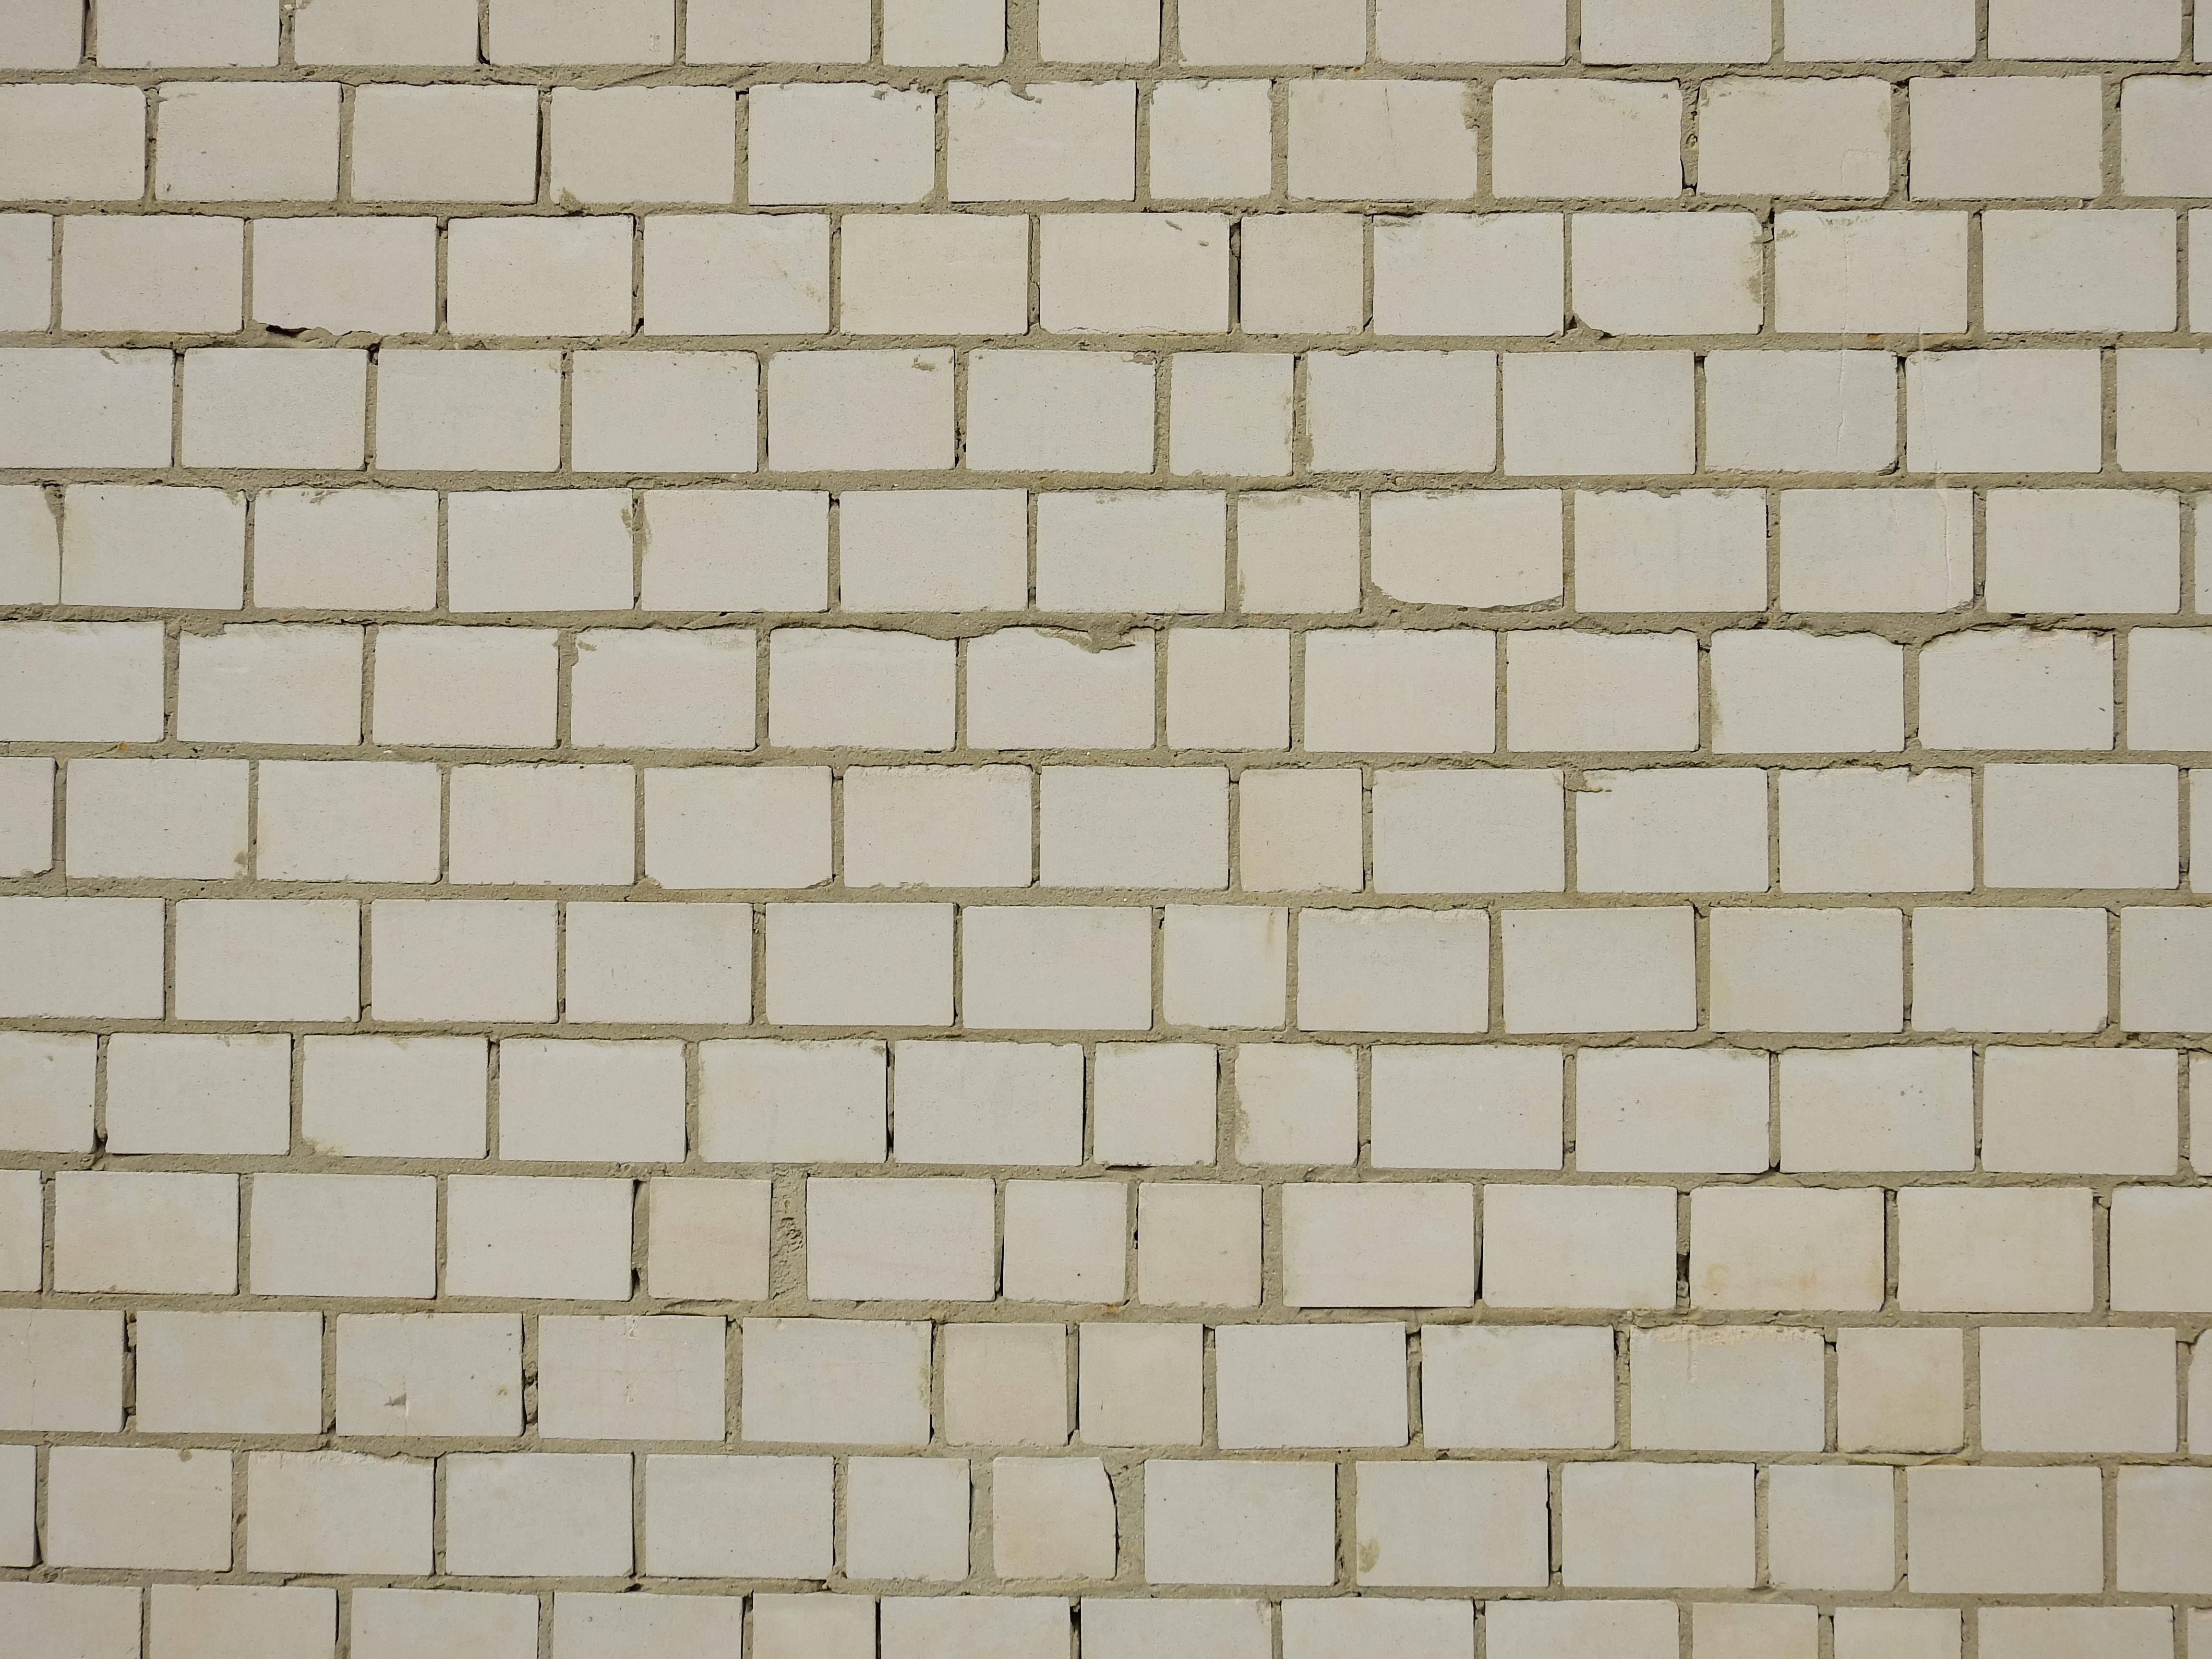 Gambar Tekstur Lantai Batu Besar Pola Ubin Dinding